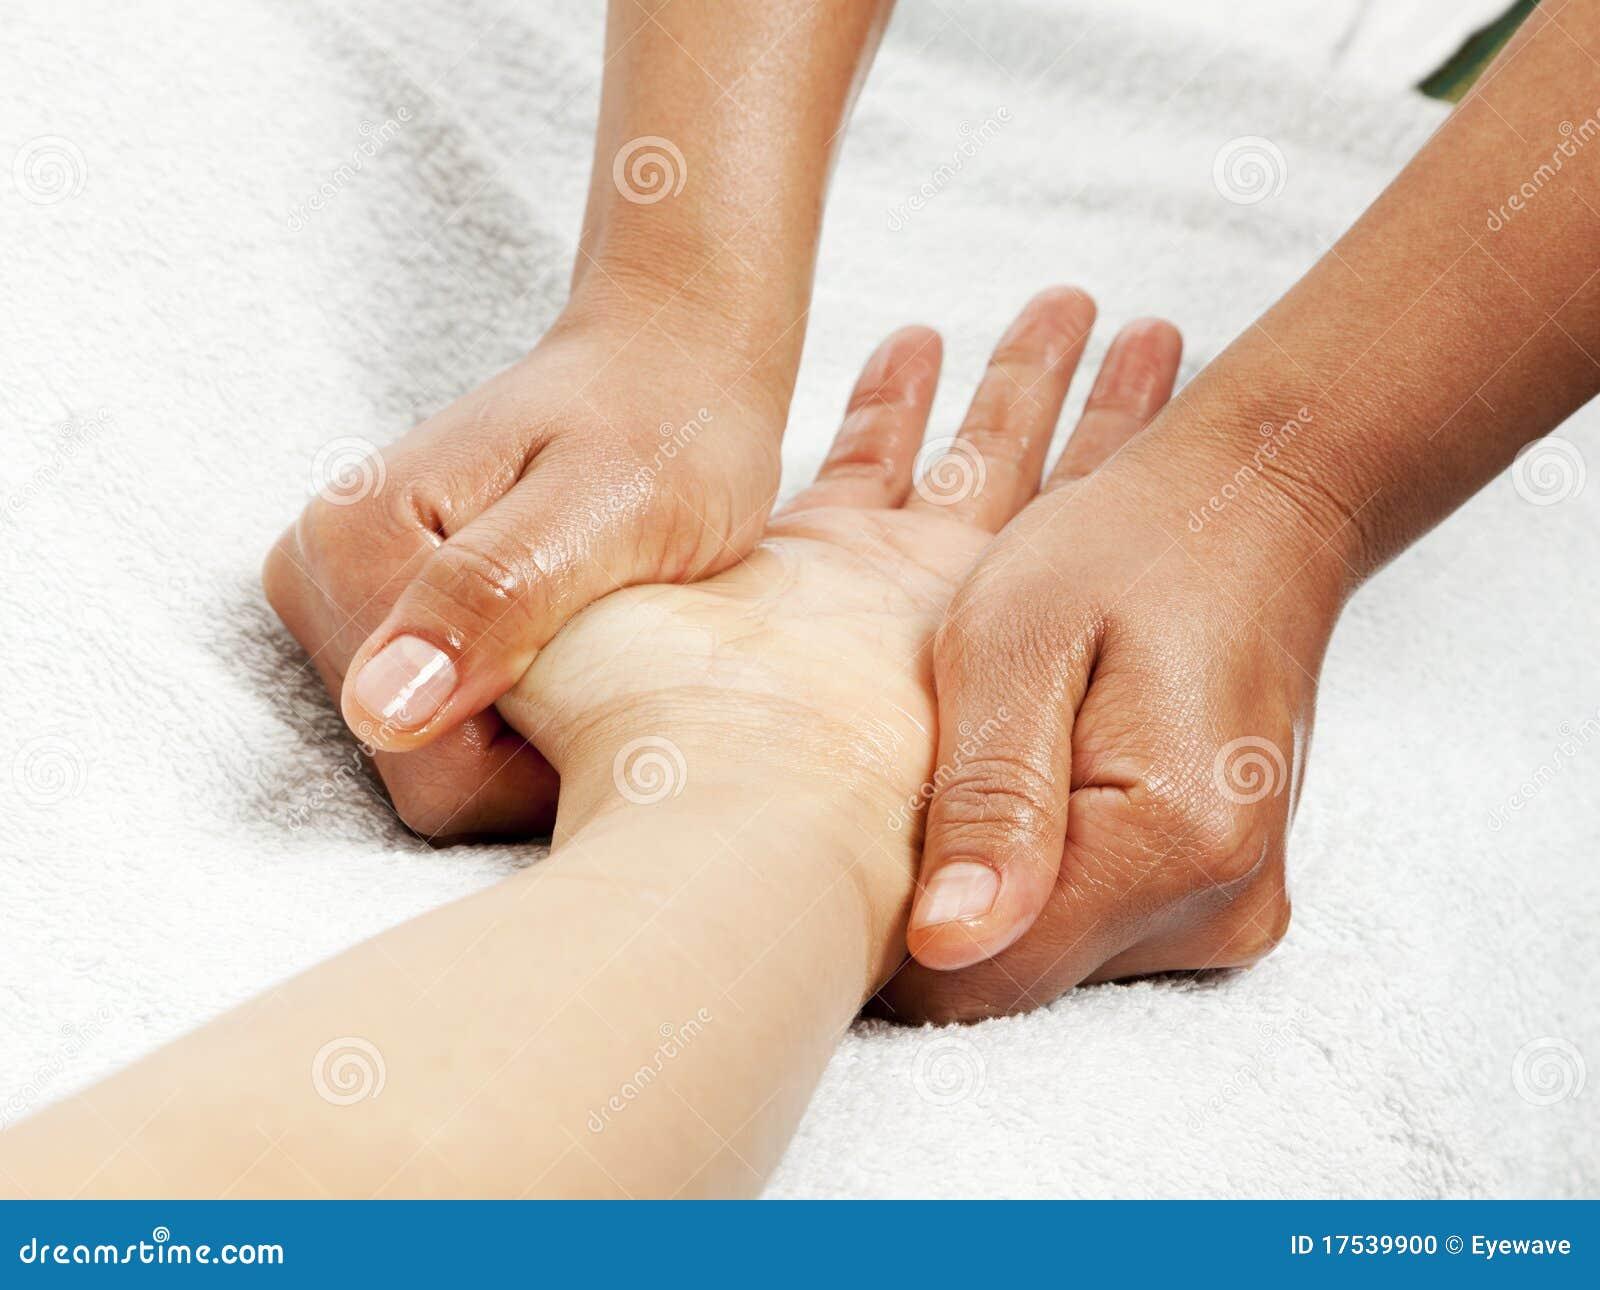 Basic principles of Reflexology hand-massage-17539900